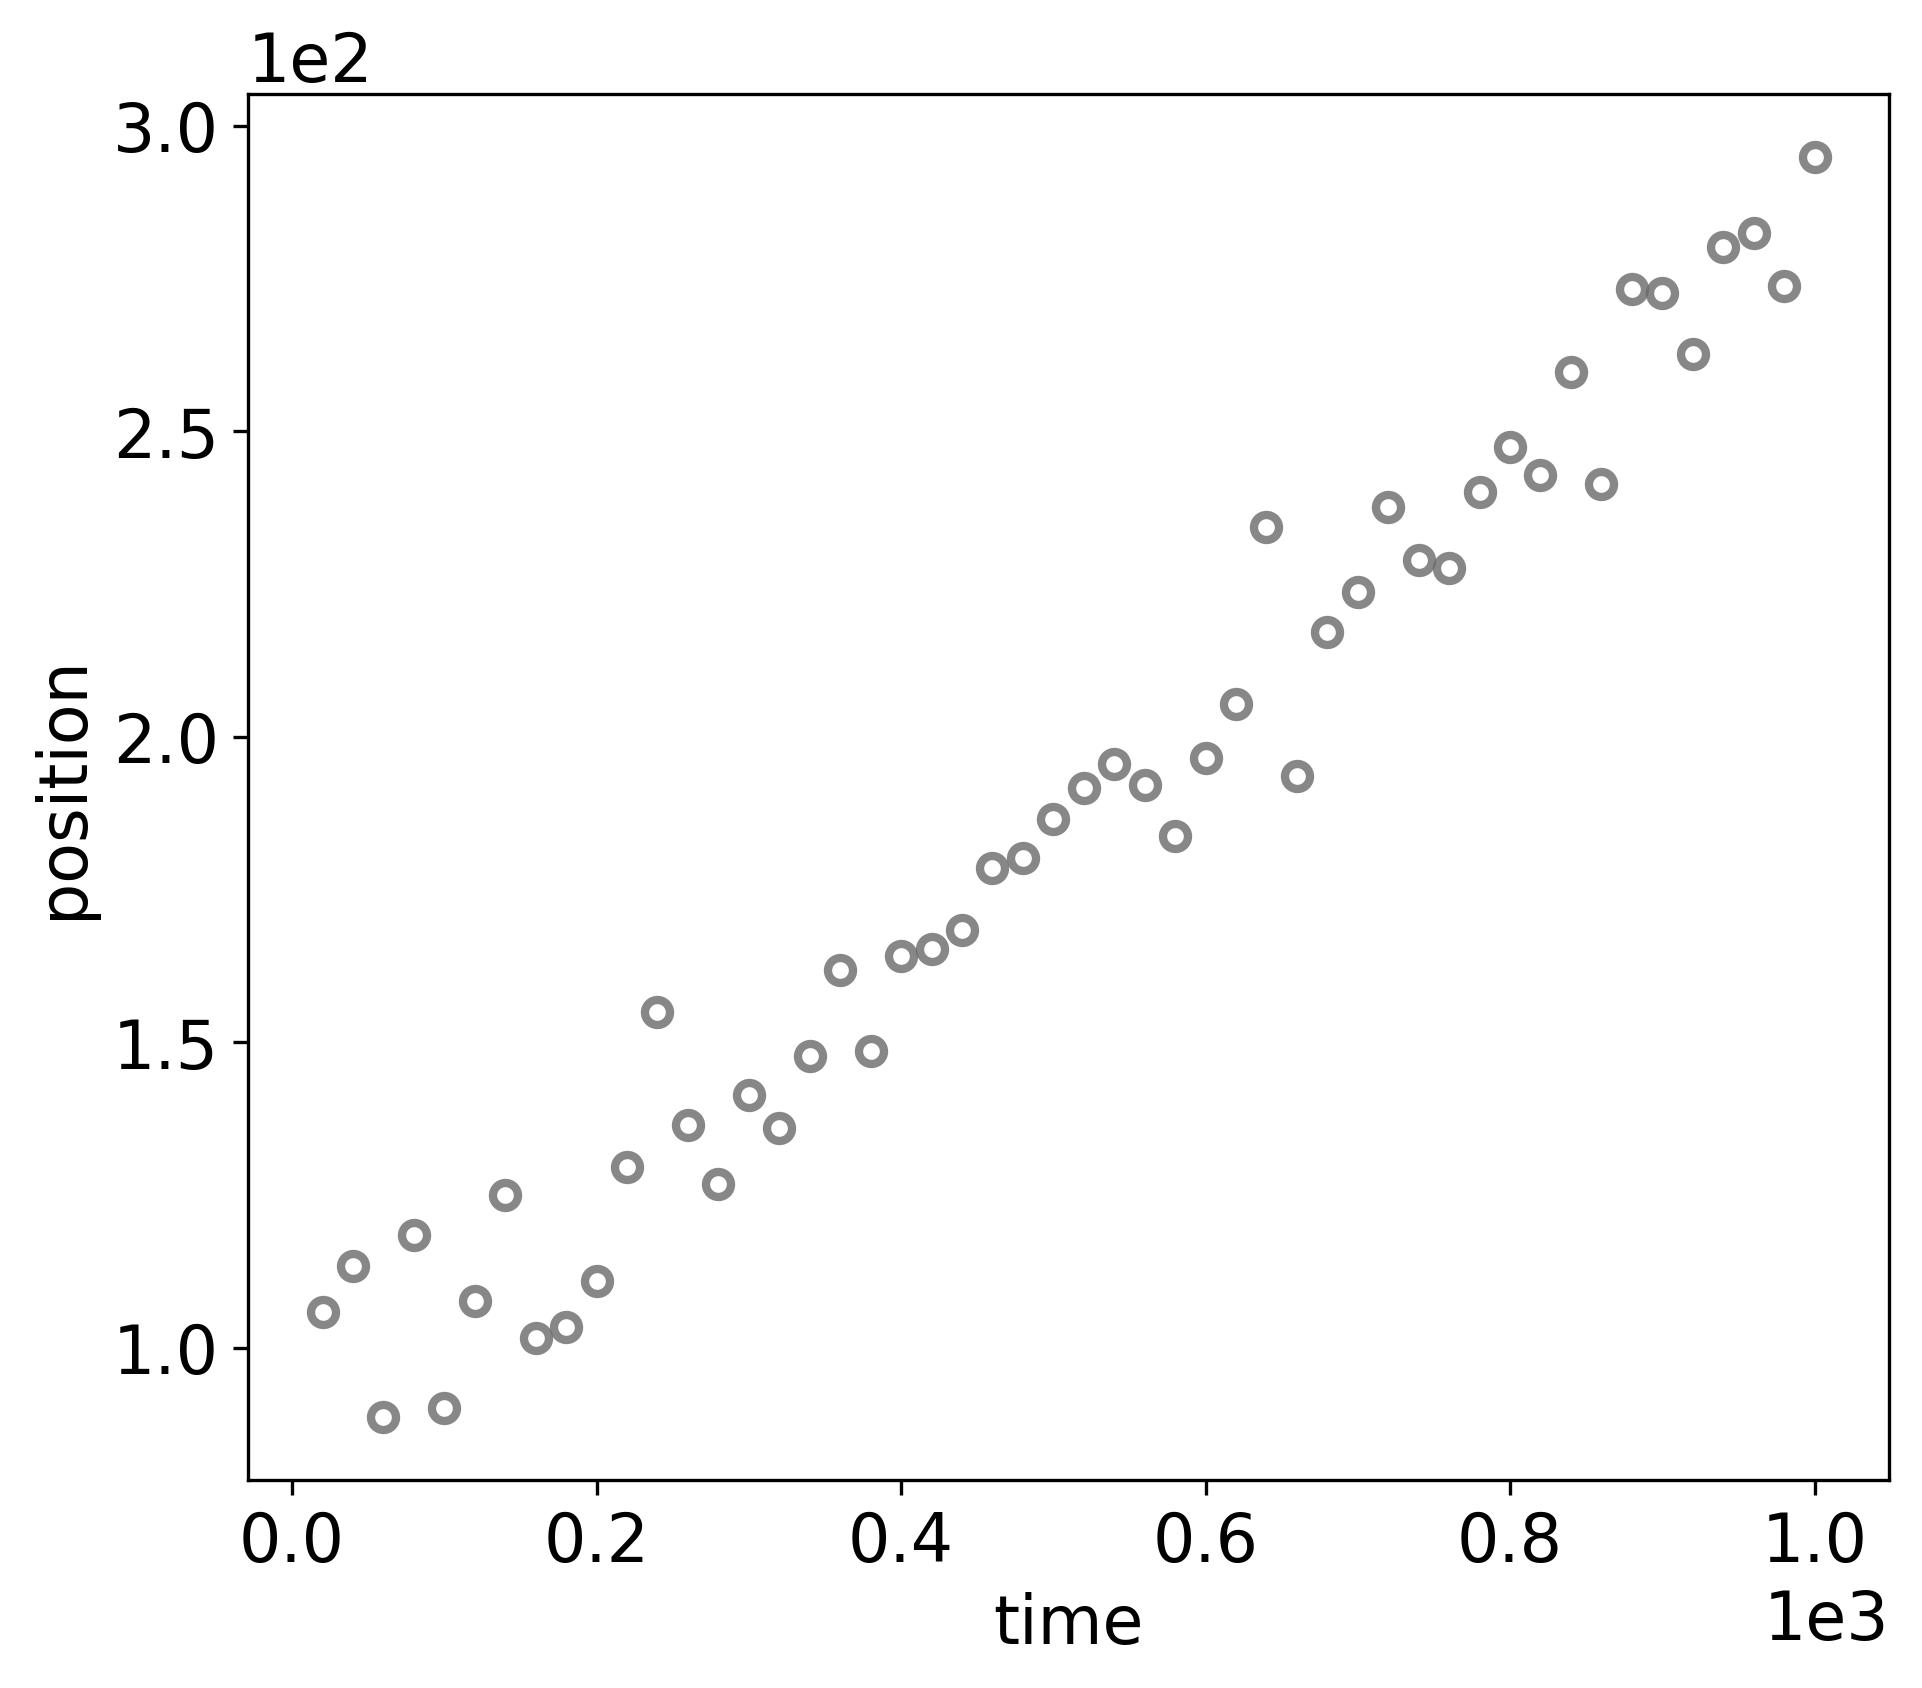 docs/_static/randomwalk/randomwalk_dataset.png